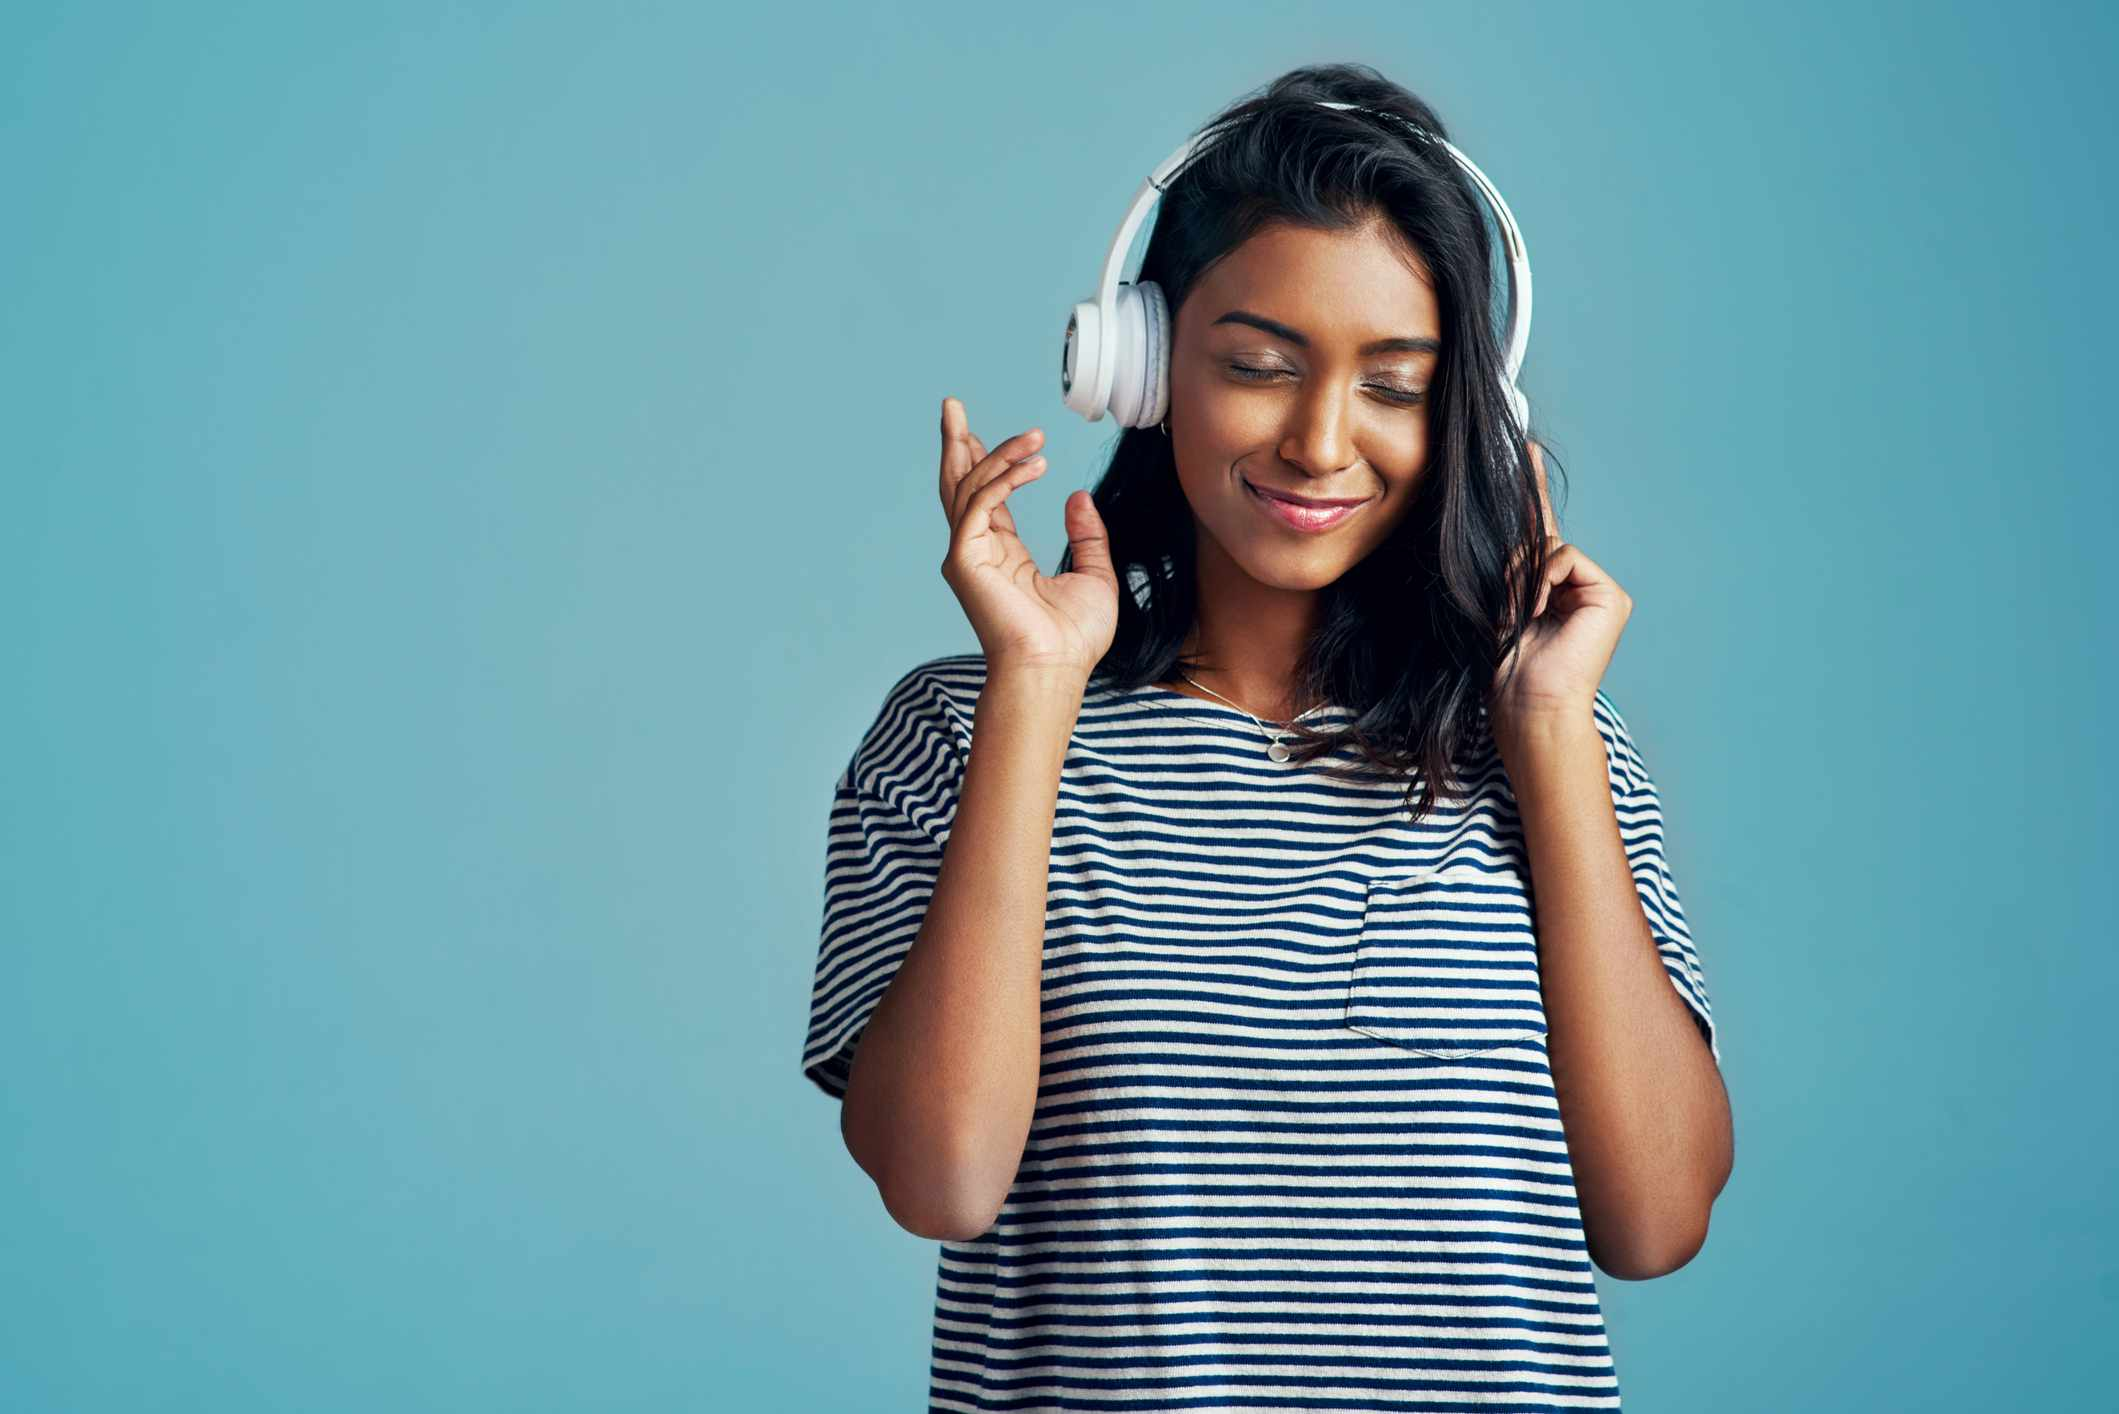 Someone listening to music through headphones, looking happy.